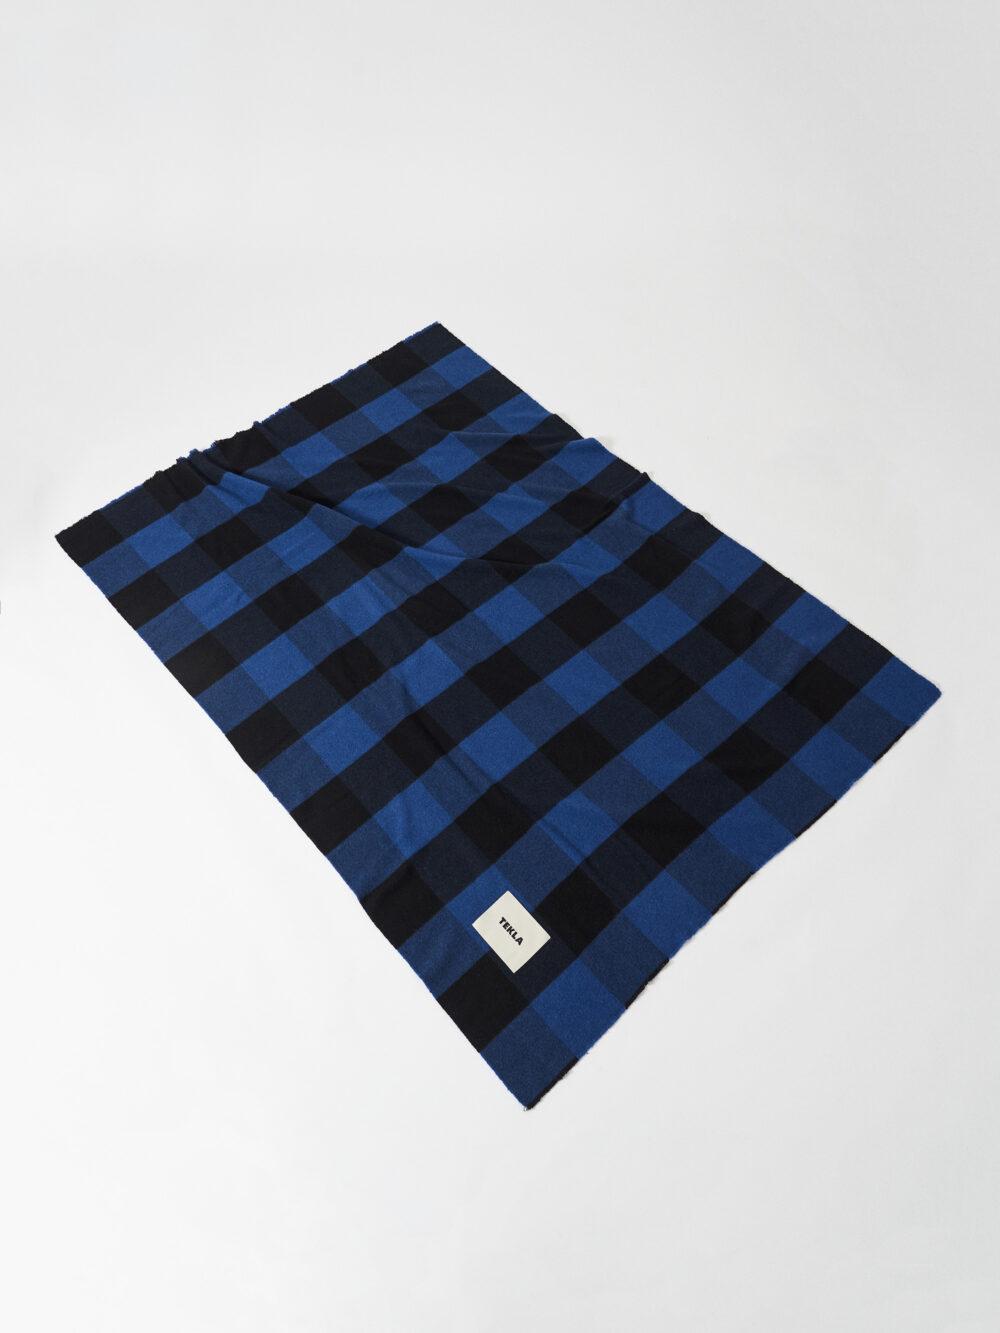 Tekla Fine Merino Blanket Black and Blue